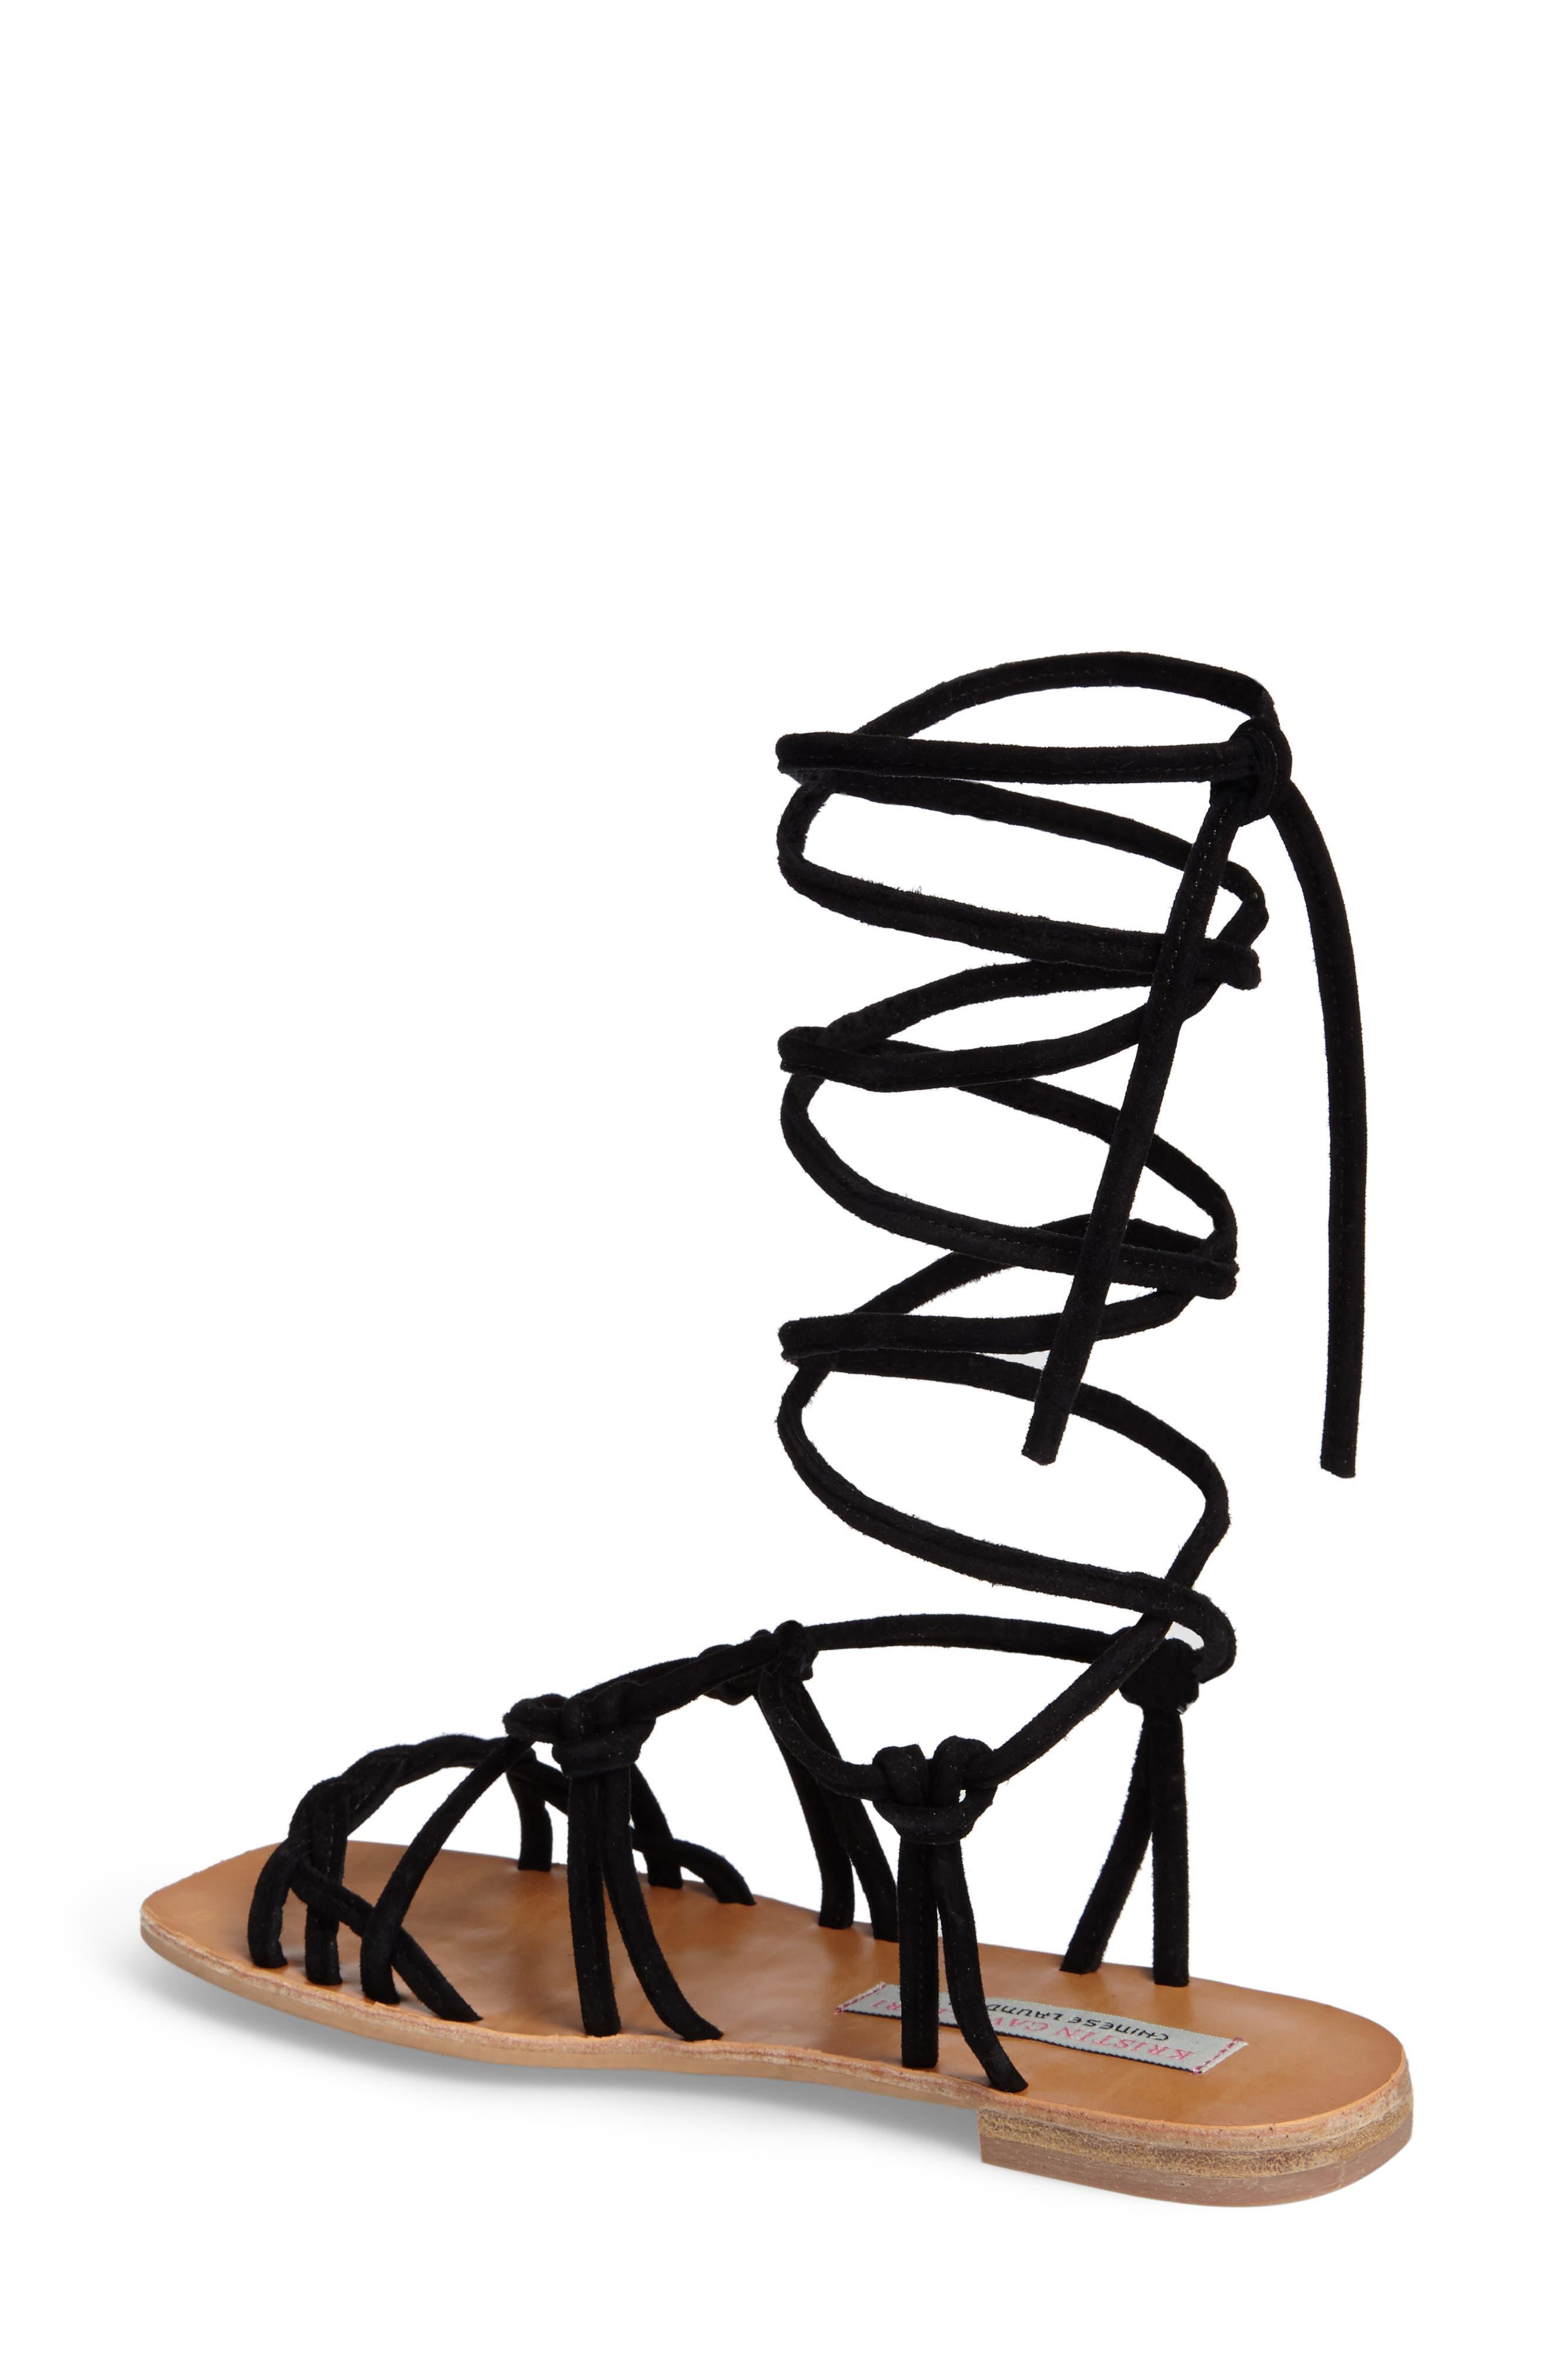 Alternate Image 3  - Kristin Cavallari Tori Knotted Wraparound Sandal (Women)